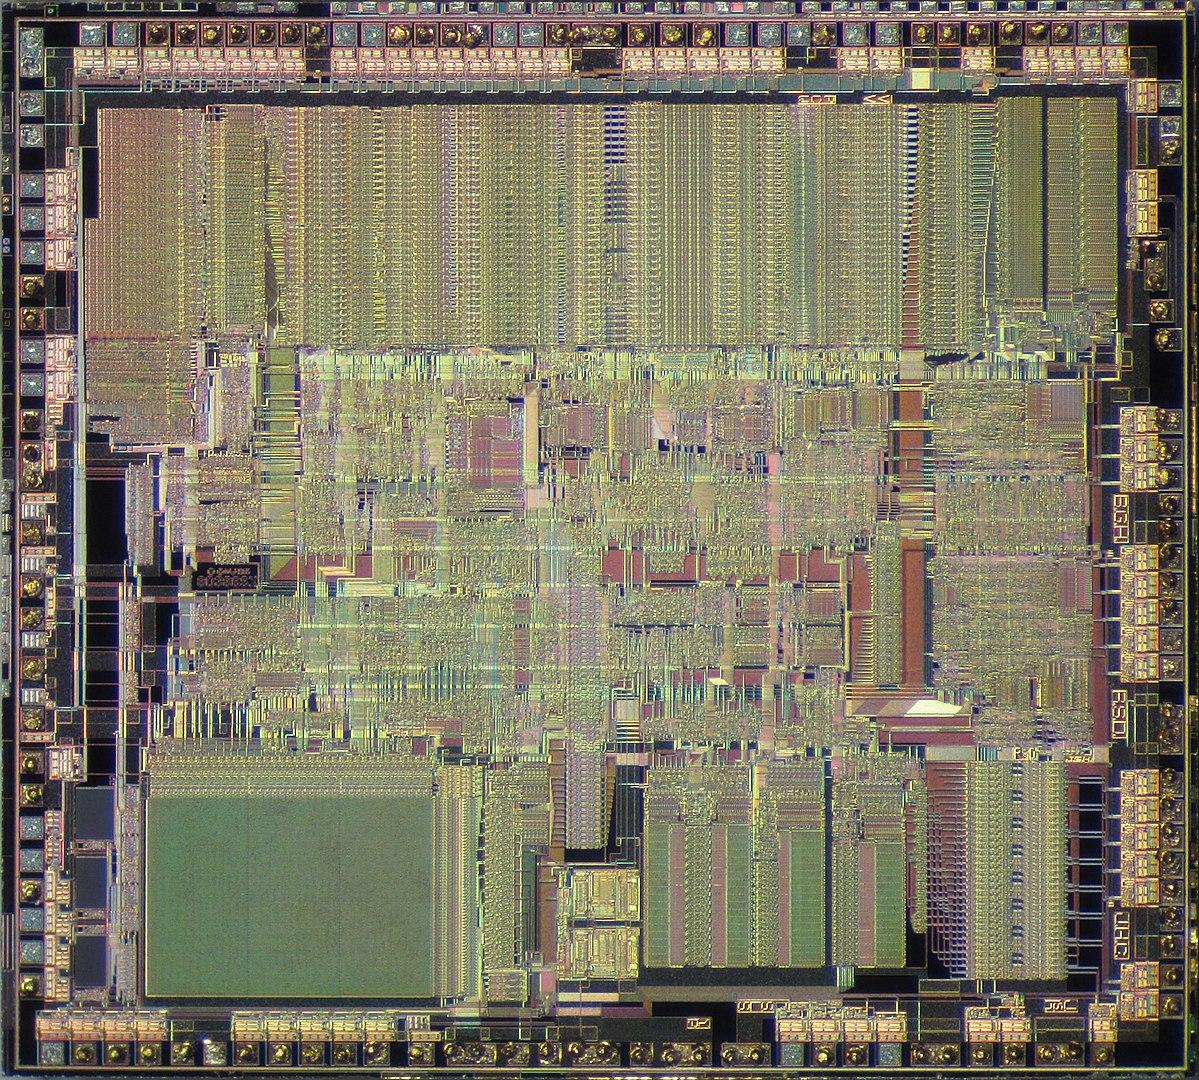 The Intel 386 die — By Pauli Rautakorpi - Own work, CC BY 3.0